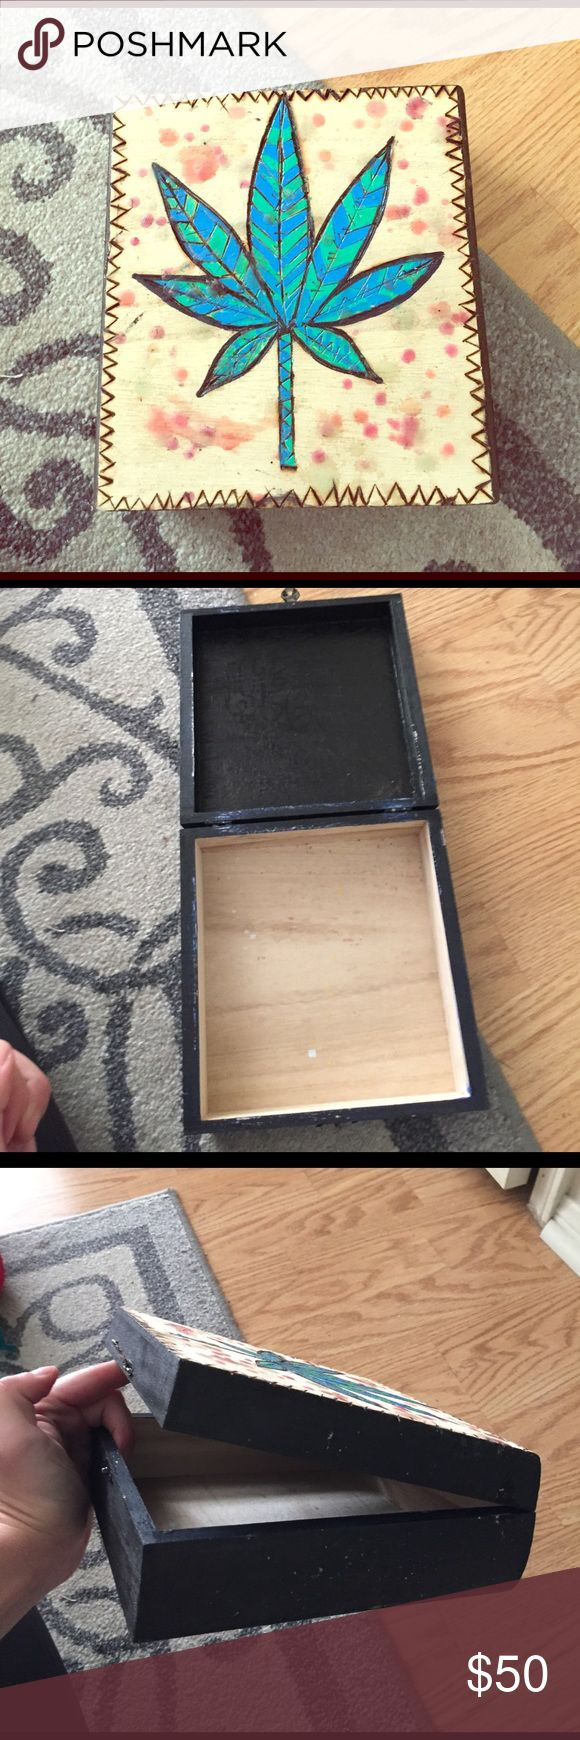 Pot leaf box Pot leaf box jewelry box chess wood box weed decoration marijuana grunge UNIF Other